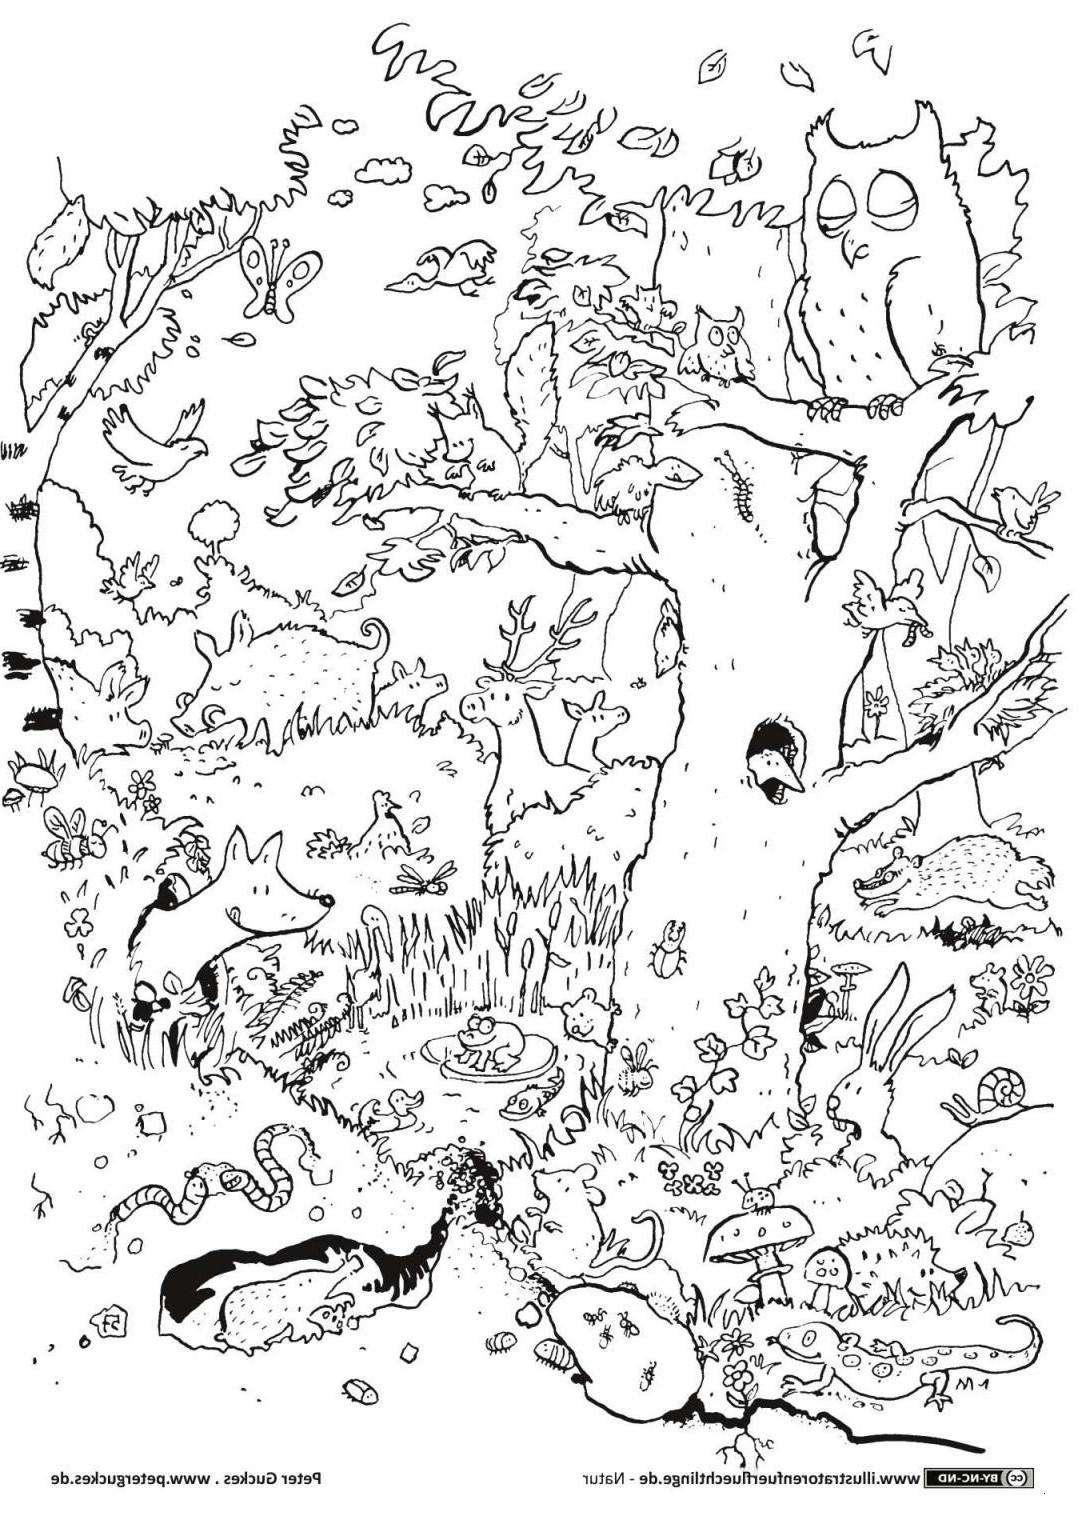 Ausmalbilder Ninjago Kai Genial 36 Luxus Ausmalbilder Ninjago Kostenlos – Große Coloring Page Sammlung Fotos